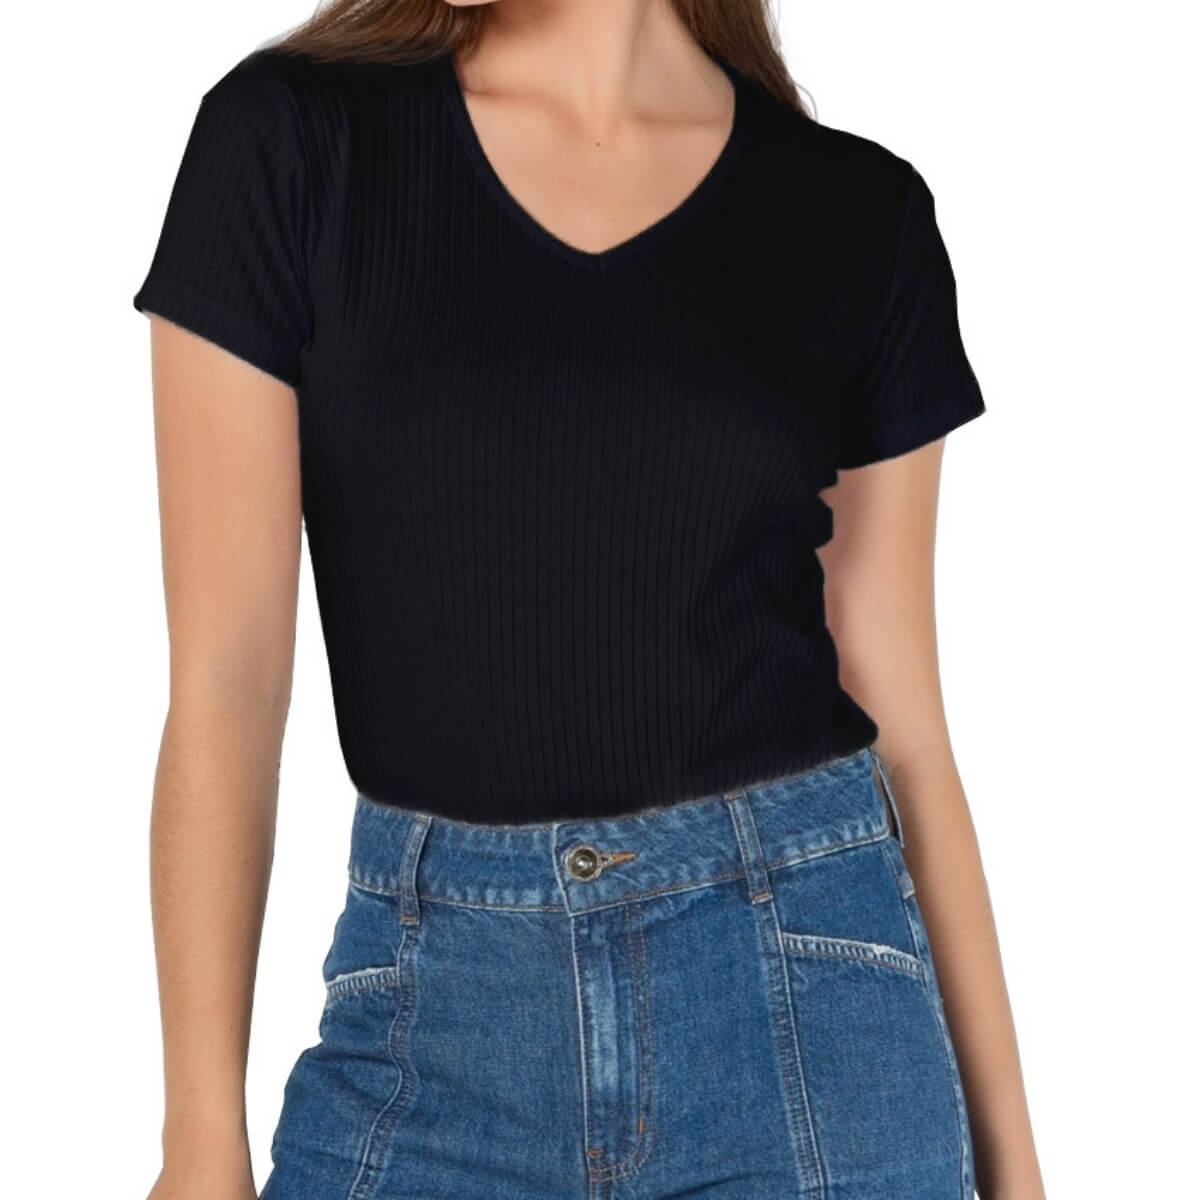 Camiseta Feminina Ribana Premium Preta